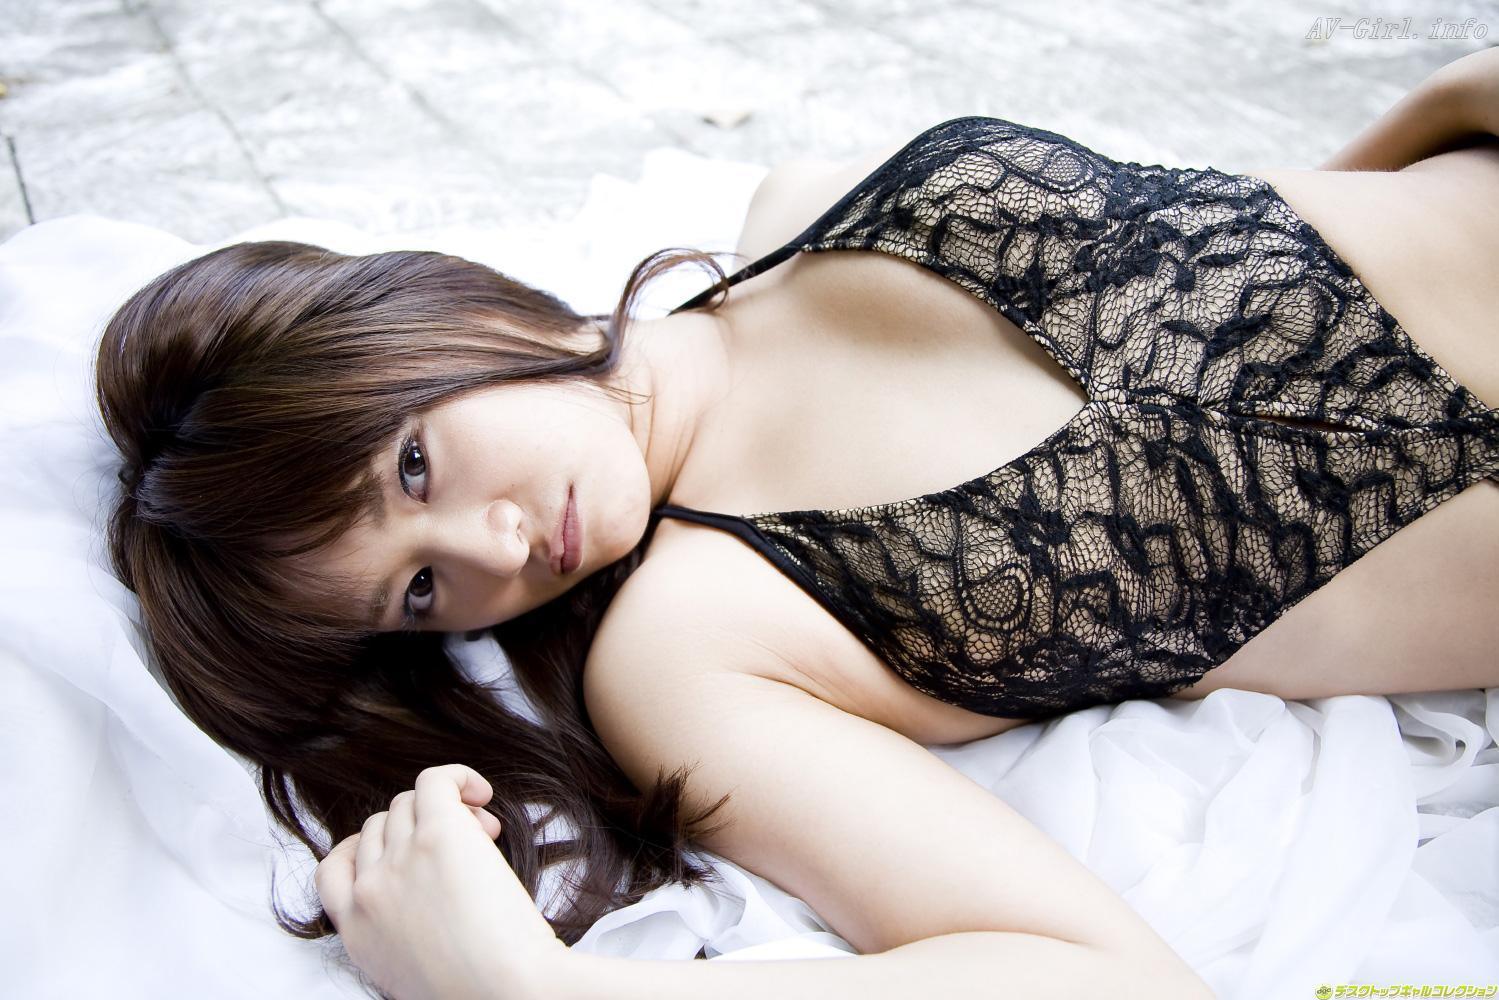 Asian Babe 8502